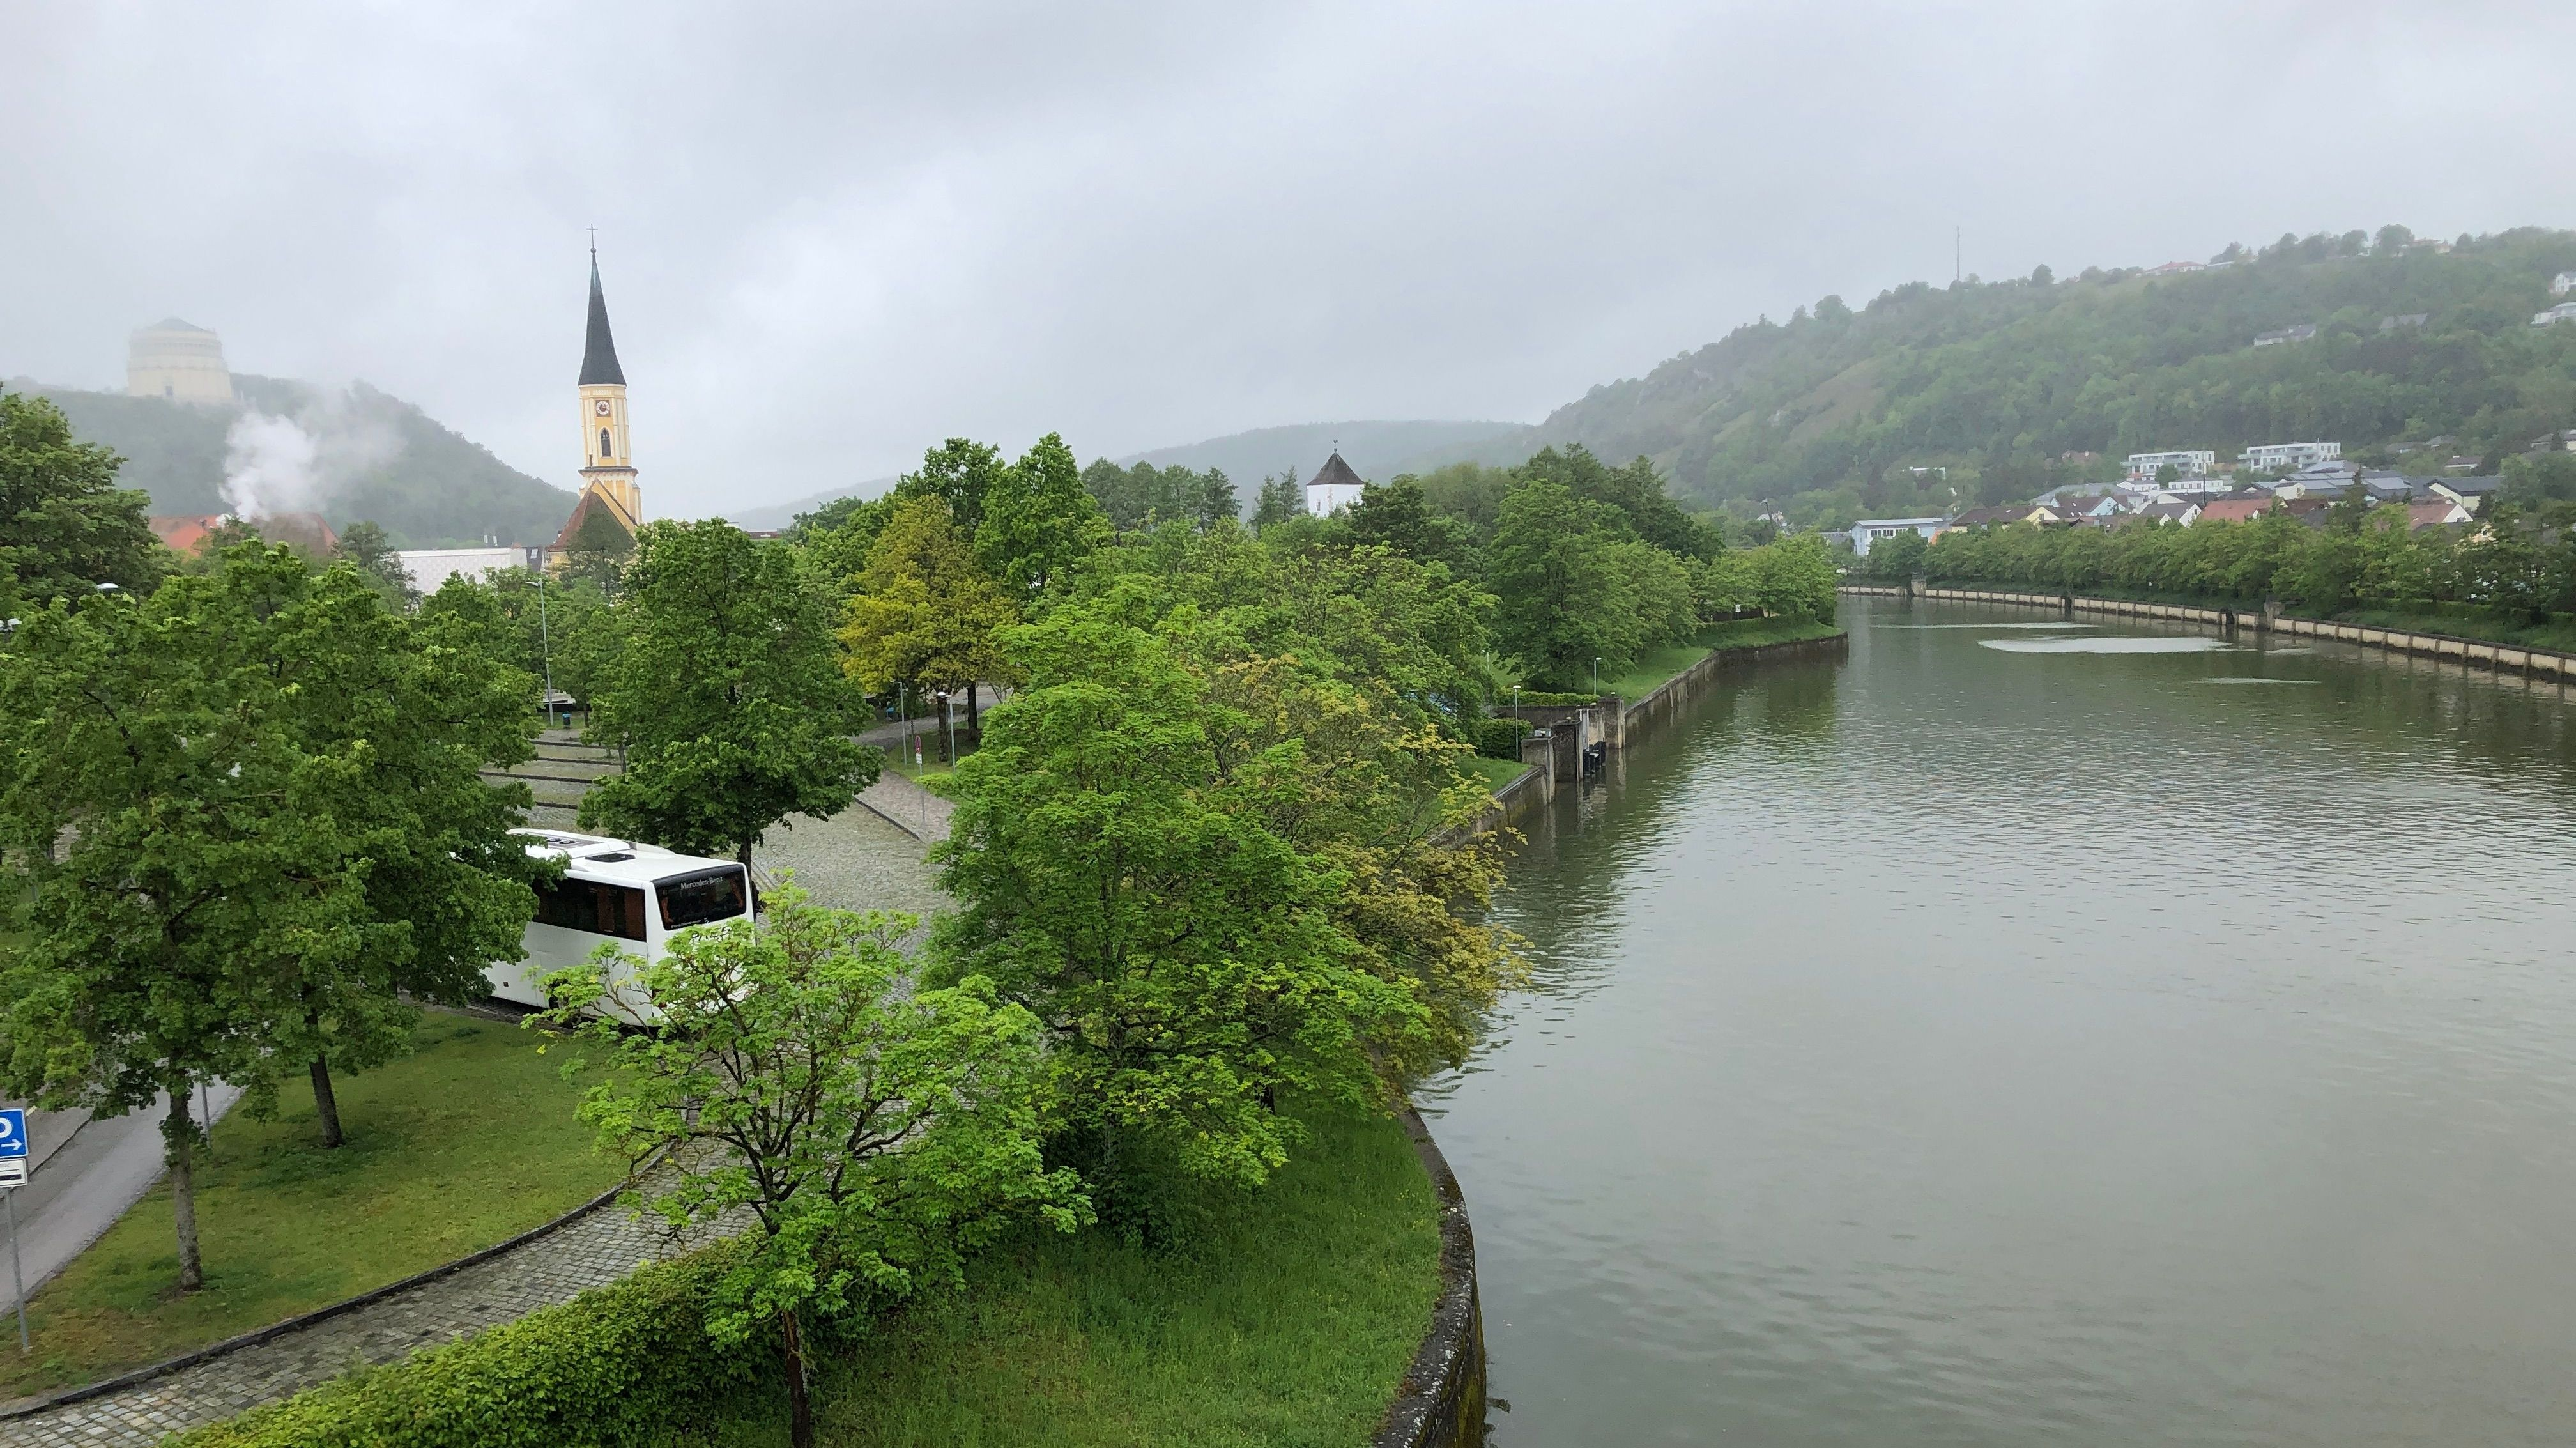 Rhein-Main-Donau-Kanal bei Kelheim